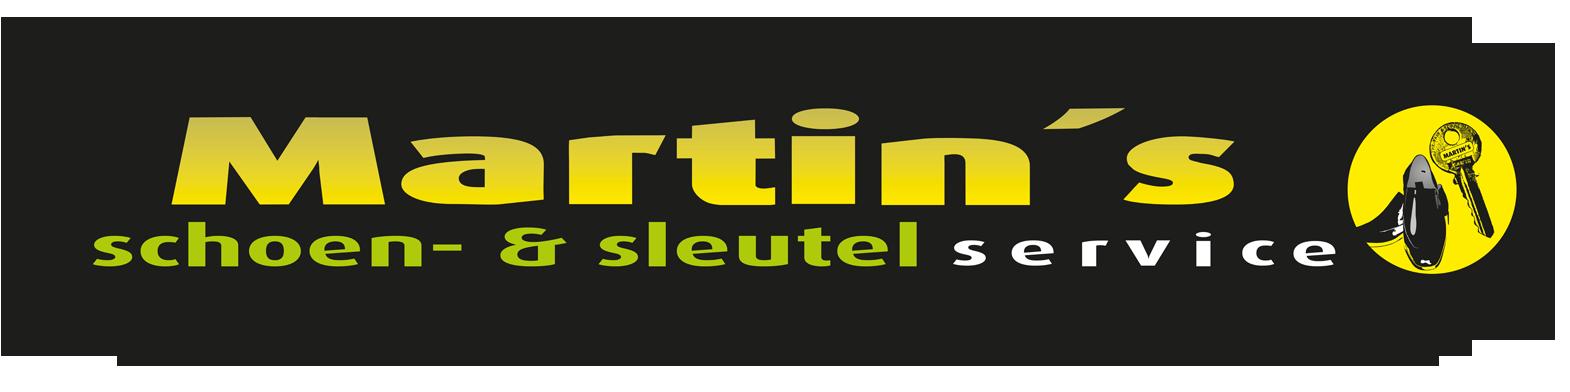 Martin Schoen- & Sleutelservice